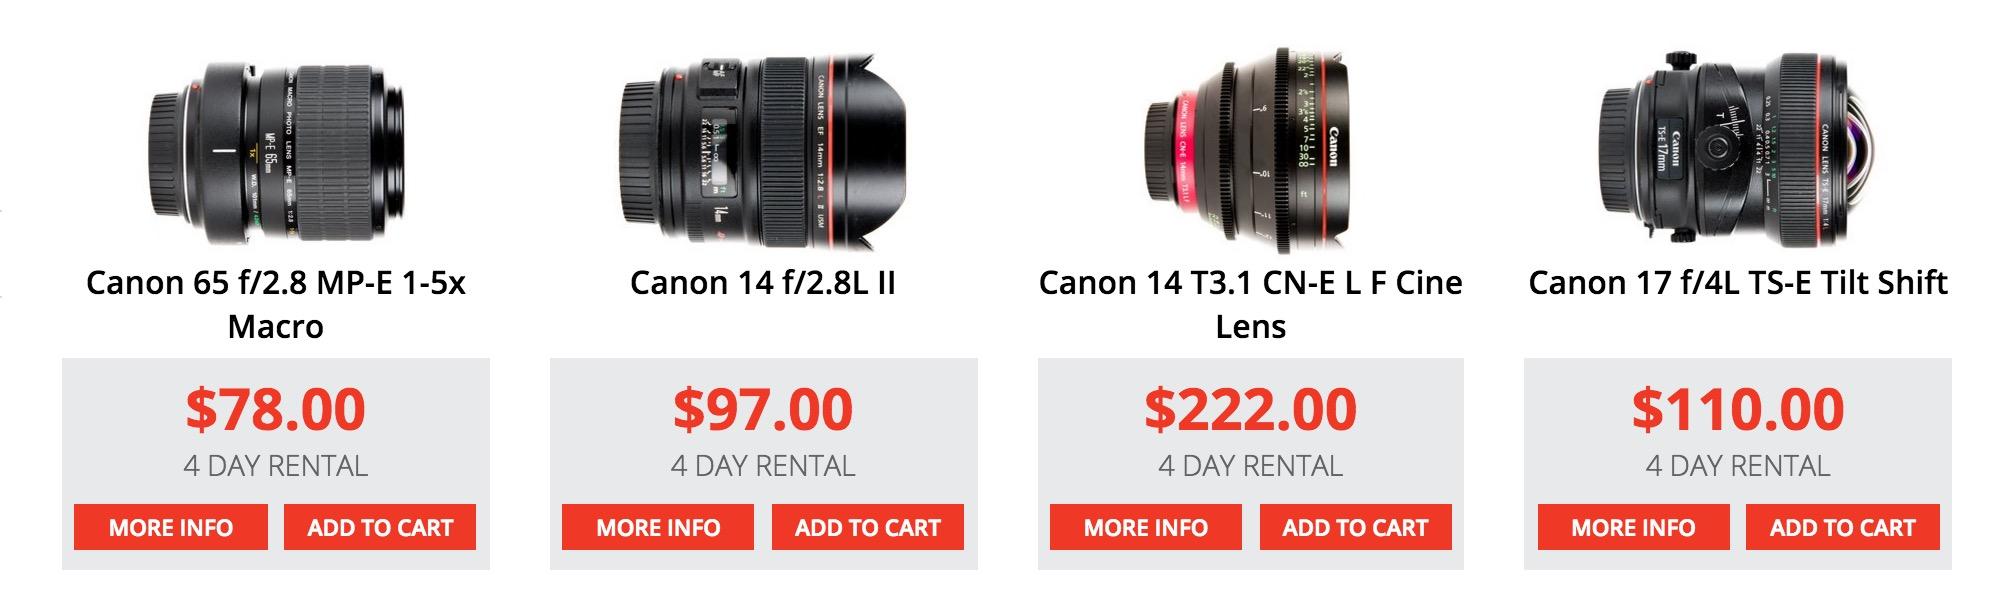 Filmmaking tools - LPTG